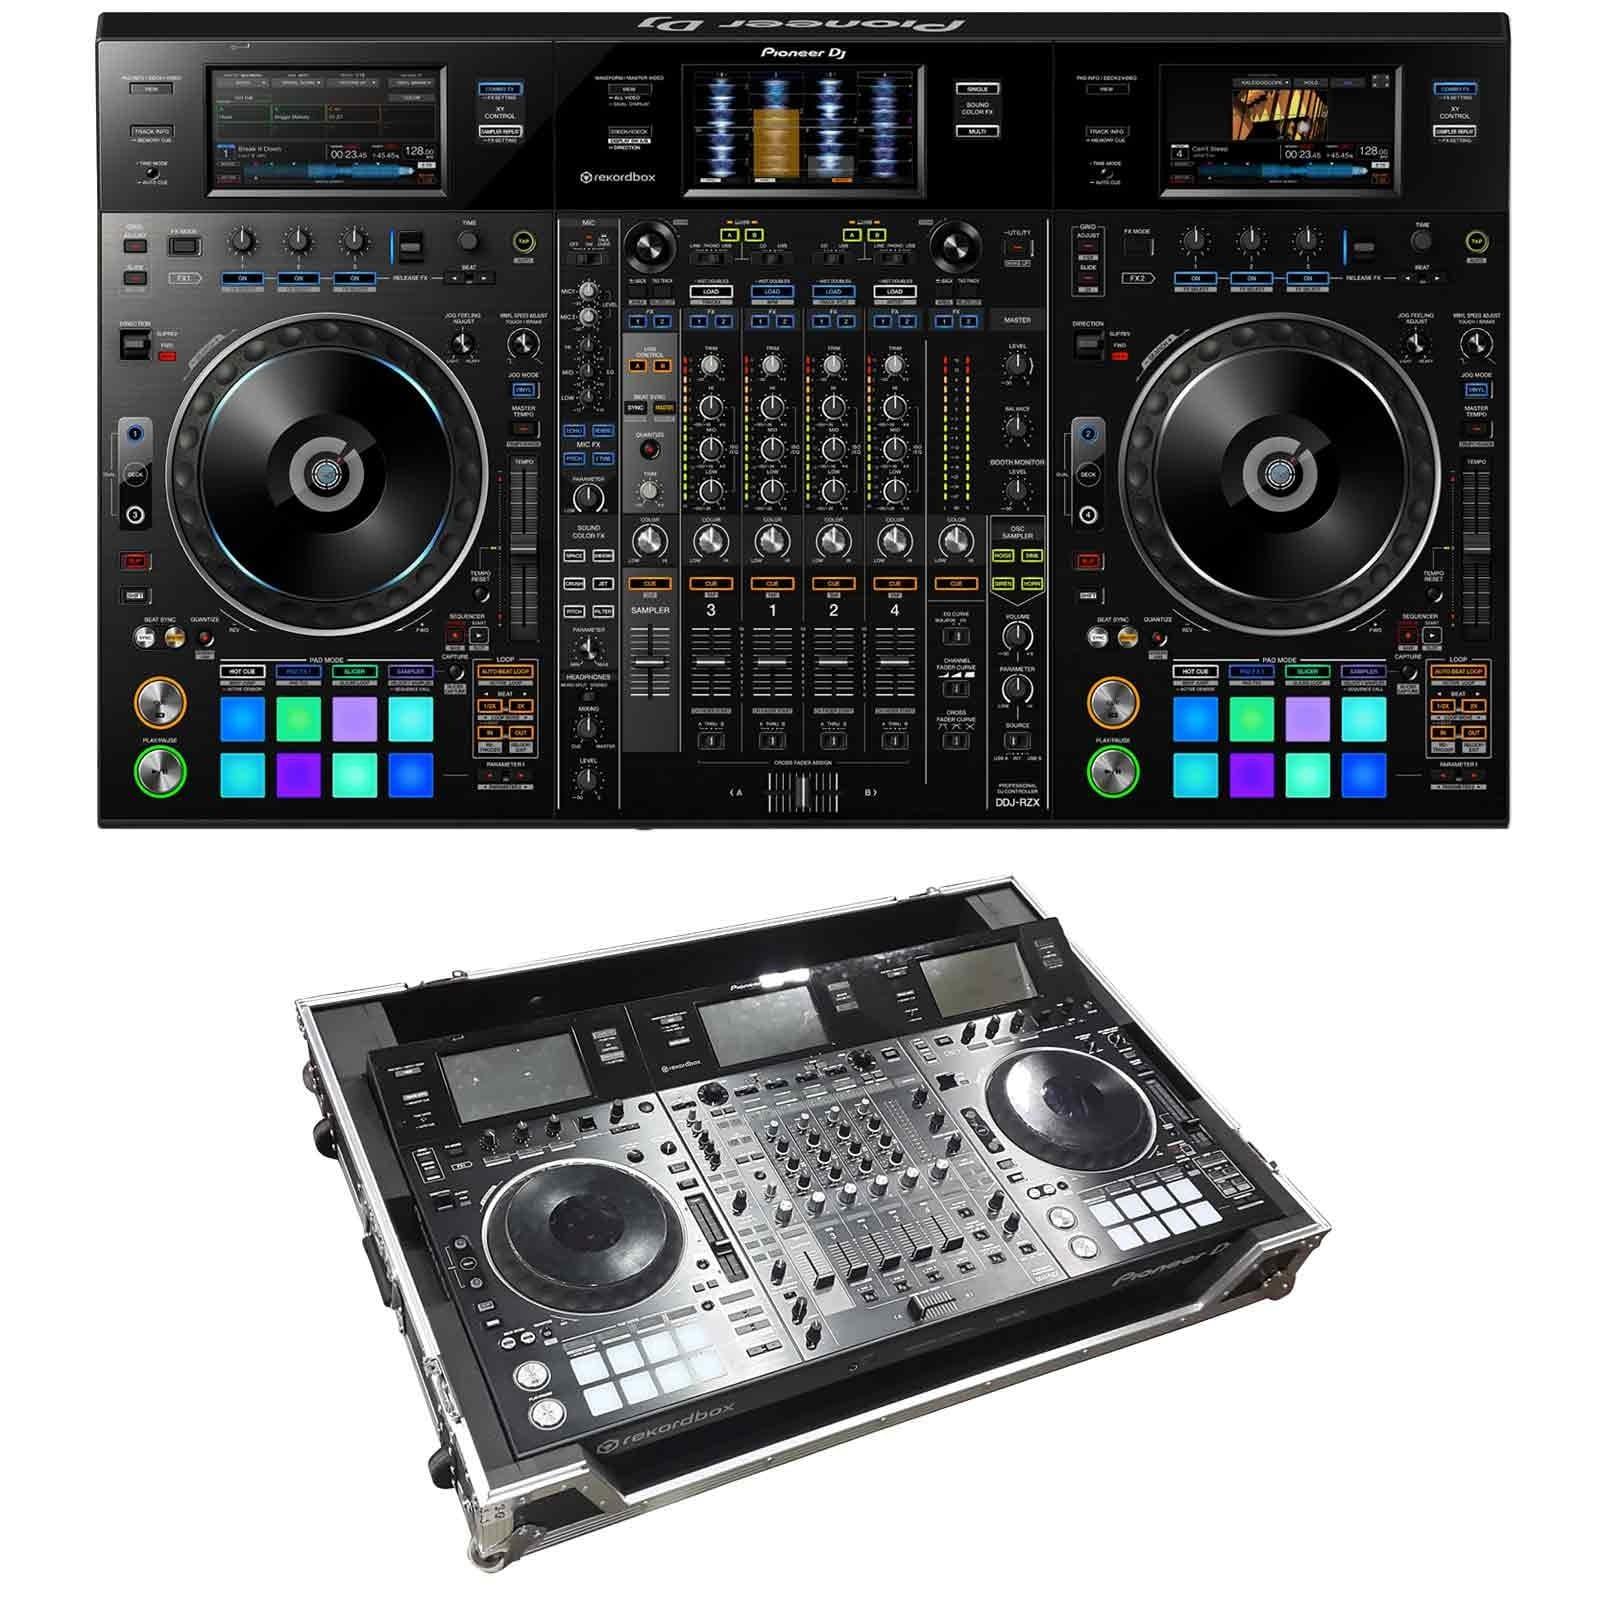 pioneer-ddj-rzx-professional-4-channel-controller-for-rekordbox-dj-rekordbox-video-with.jpg